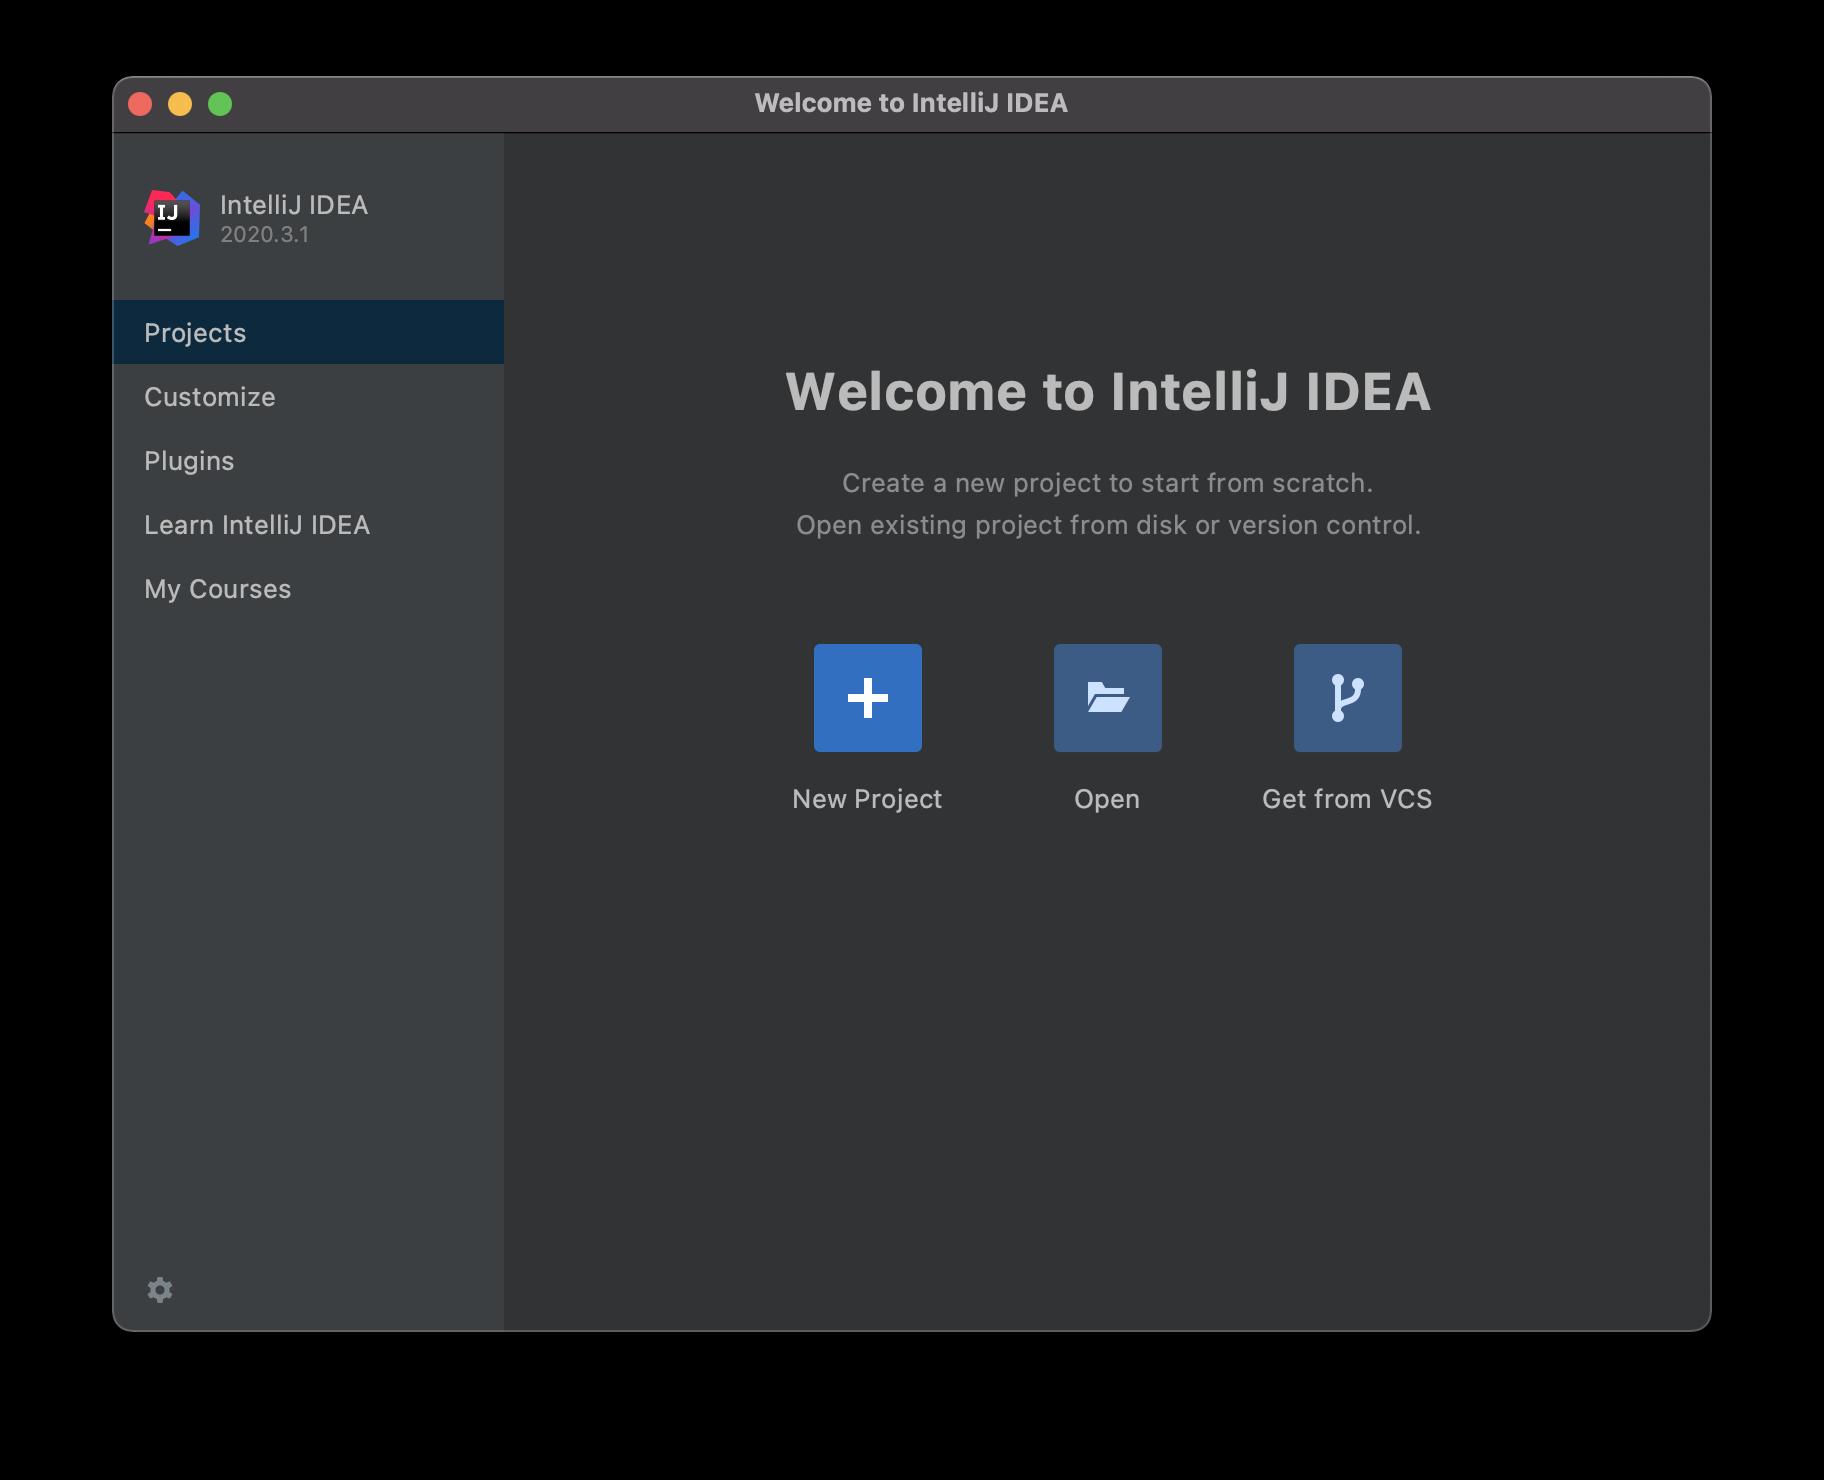 Welcome to IntelliJ IDEA